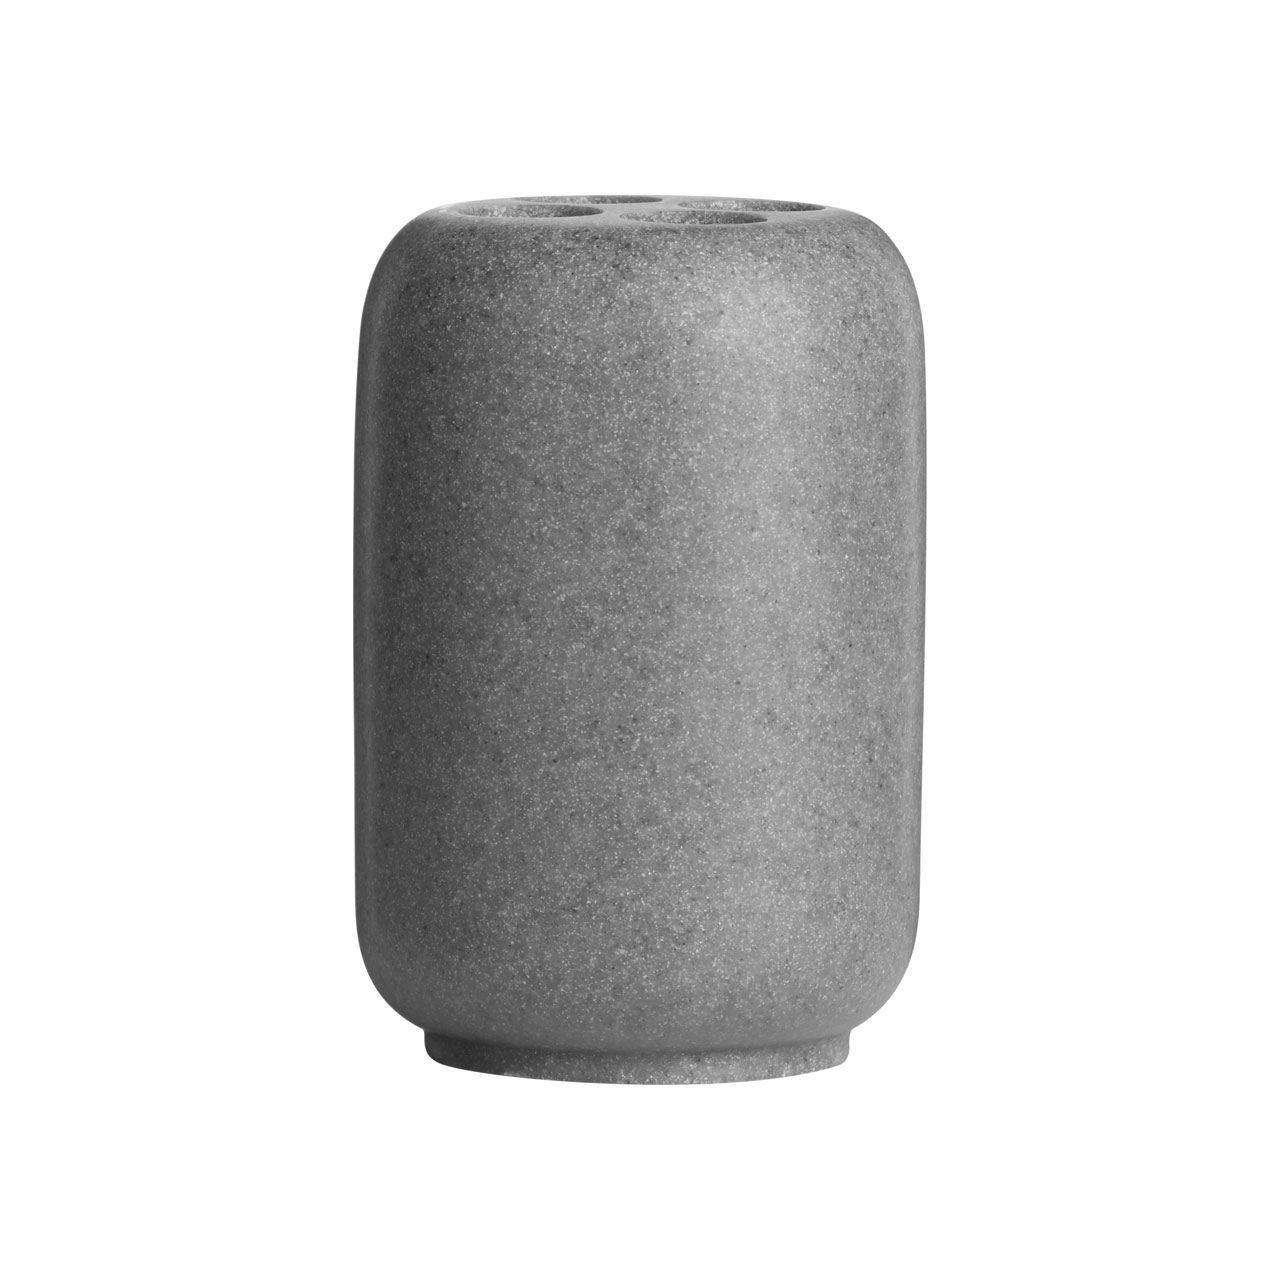 4 Piece Grey Stone Bathroom Accessory Set Tumbler